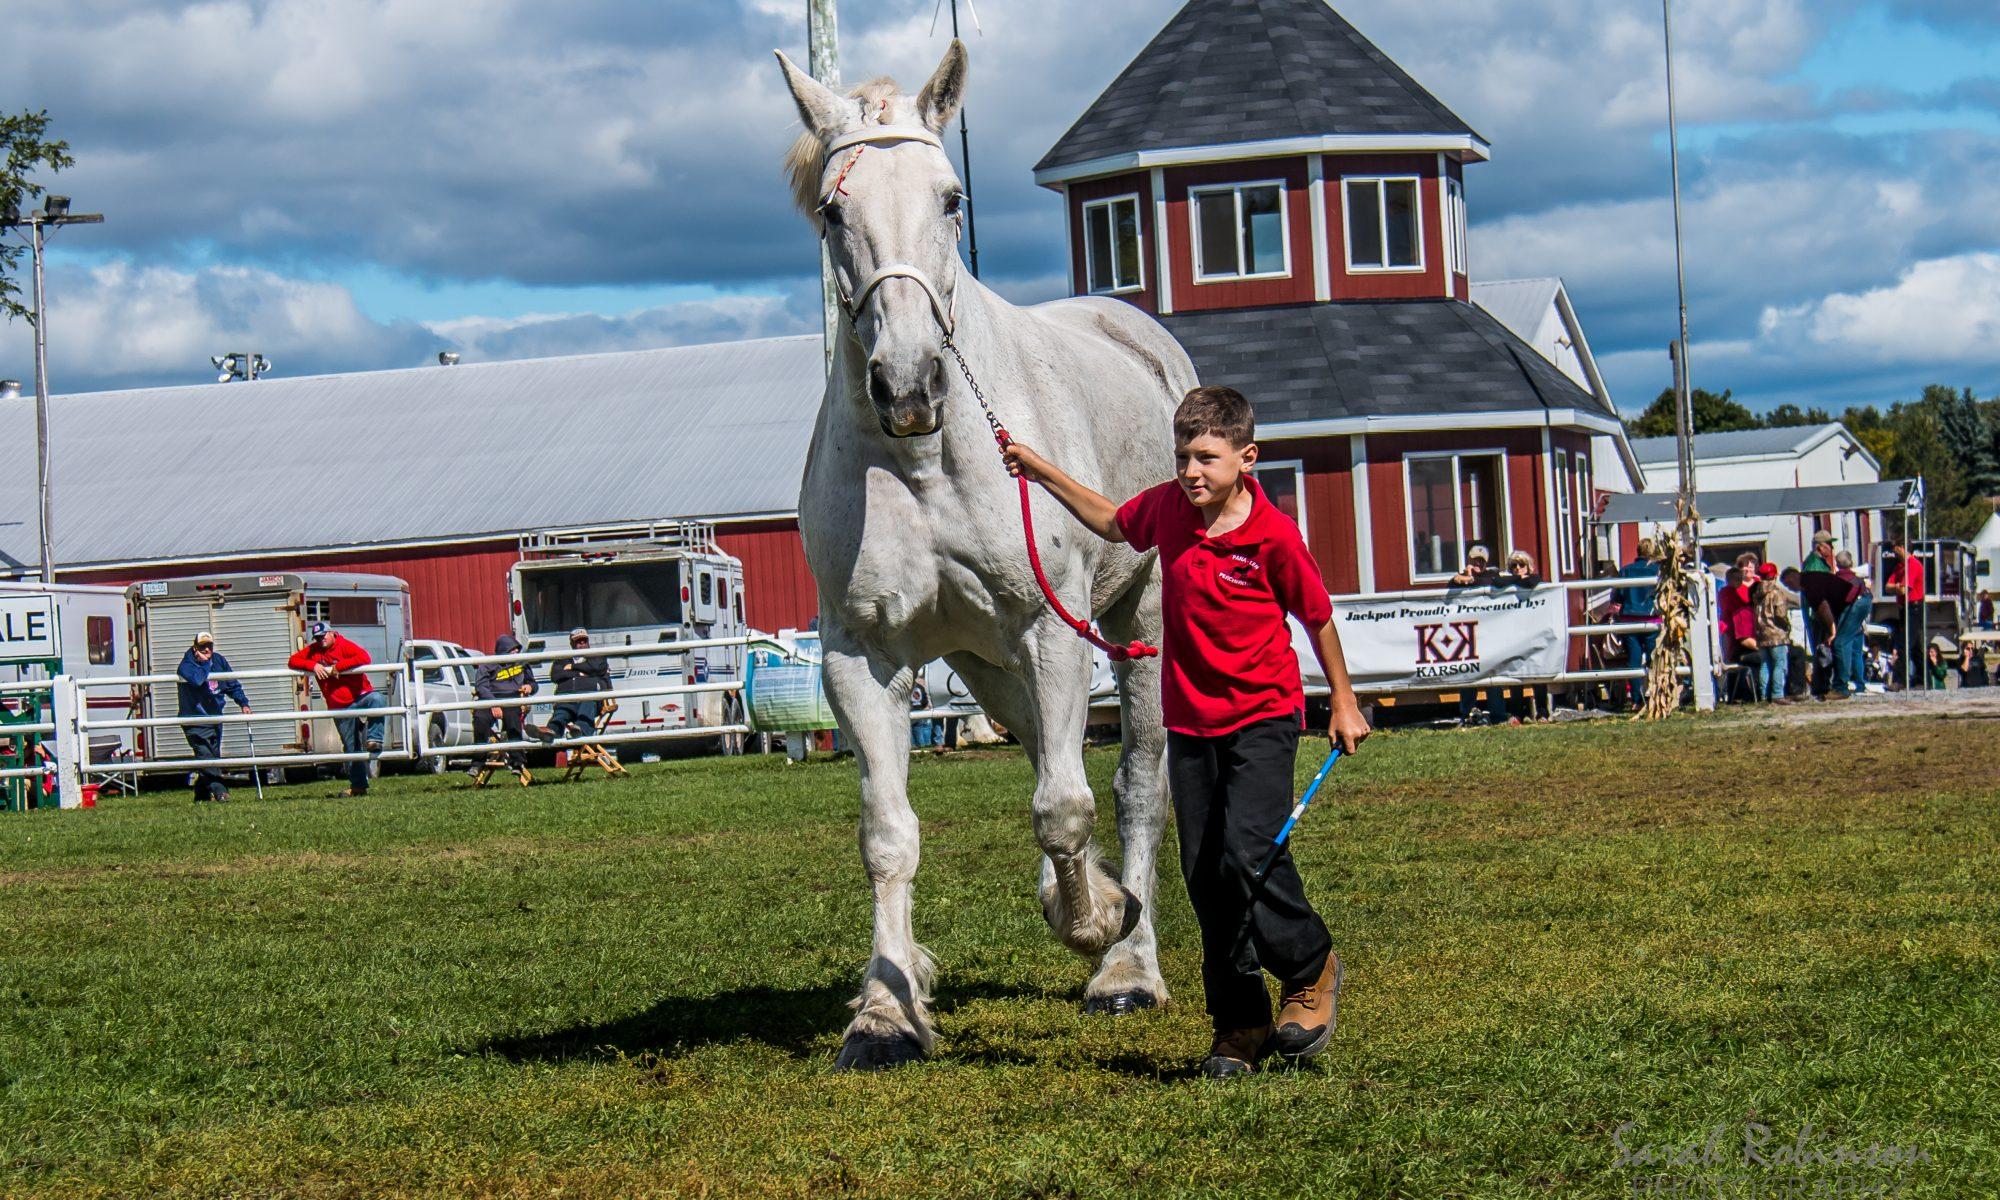 percheron; pana-len percherons; draft horse; heavy horse; greg bourbonnais; paul bourbonnais; gelding; geldings; heavy horses; bradley bourbonnais